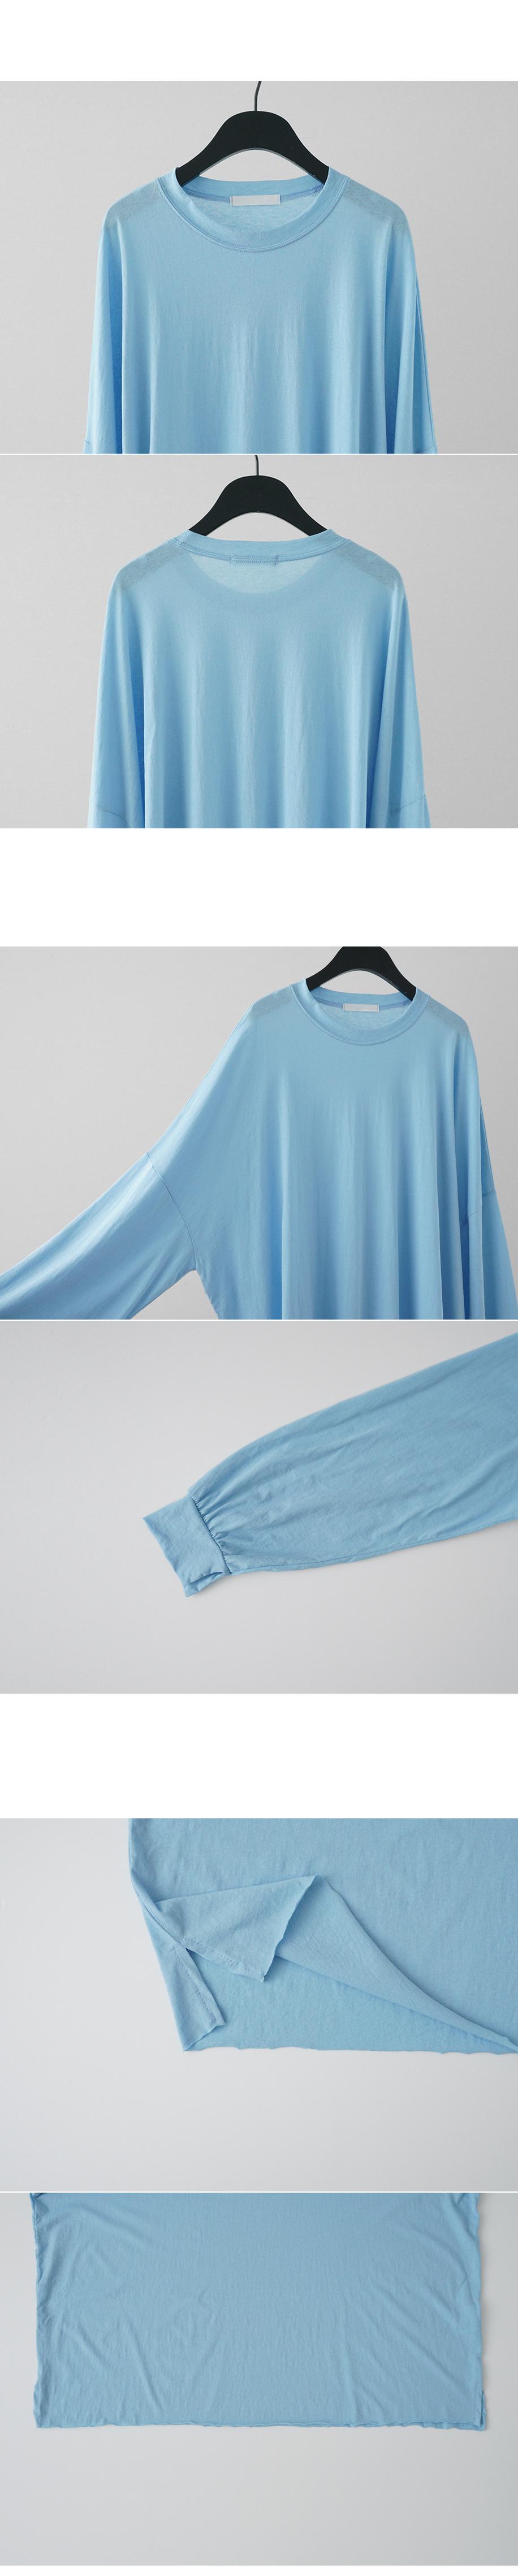 soft texture daily T-shirt